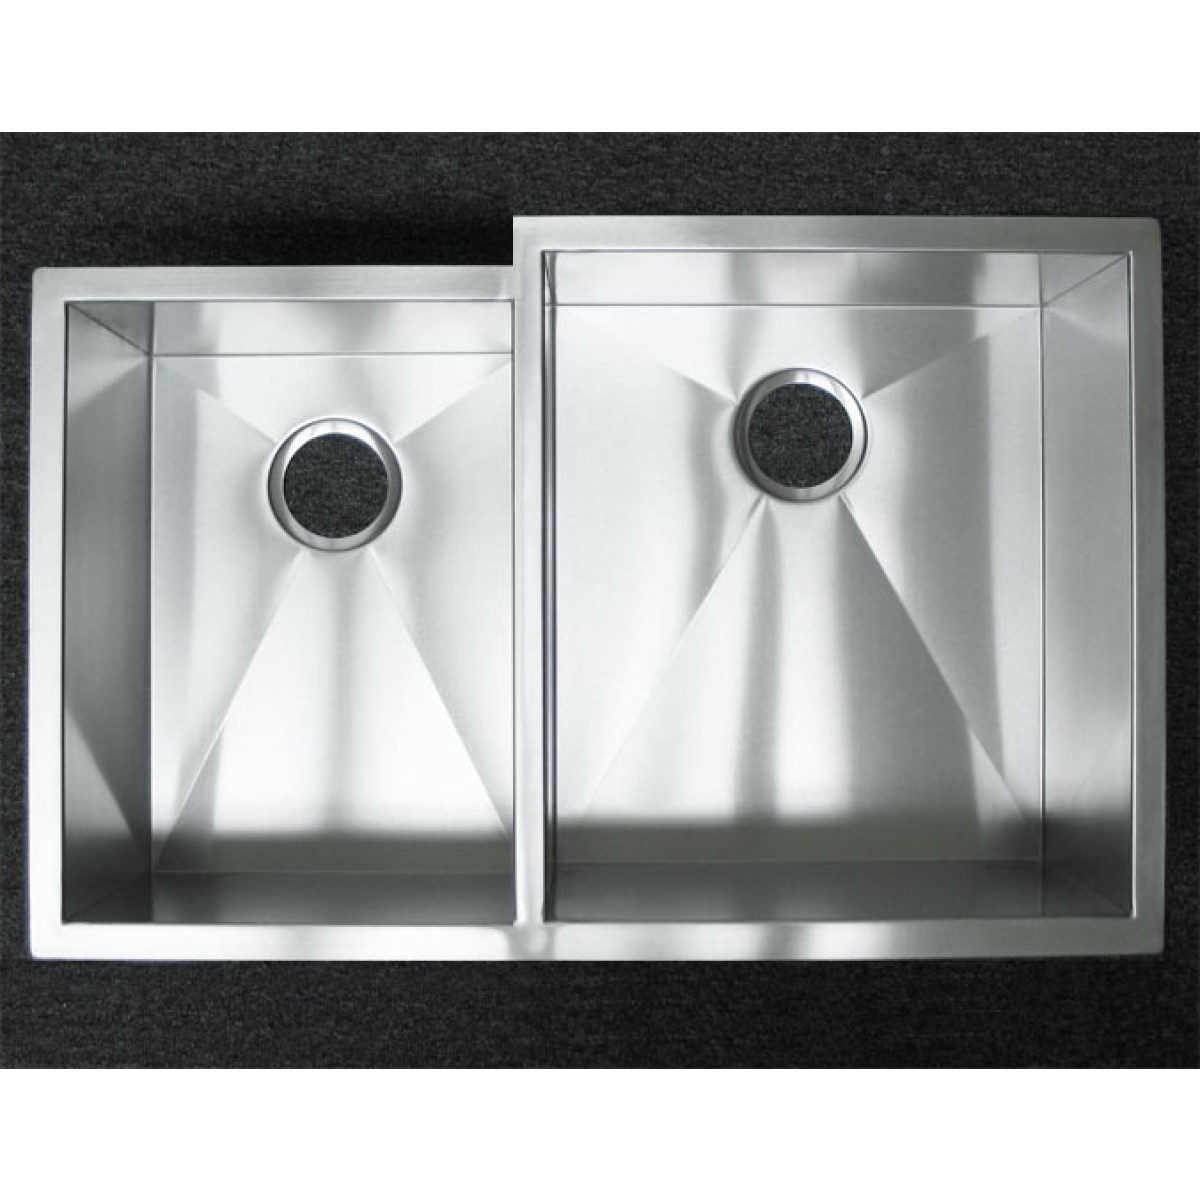 33 inch stainless steel undermount 4060 offset double bowl kitchen sink zero radius design. beautiful ideas. Home Design Ideas